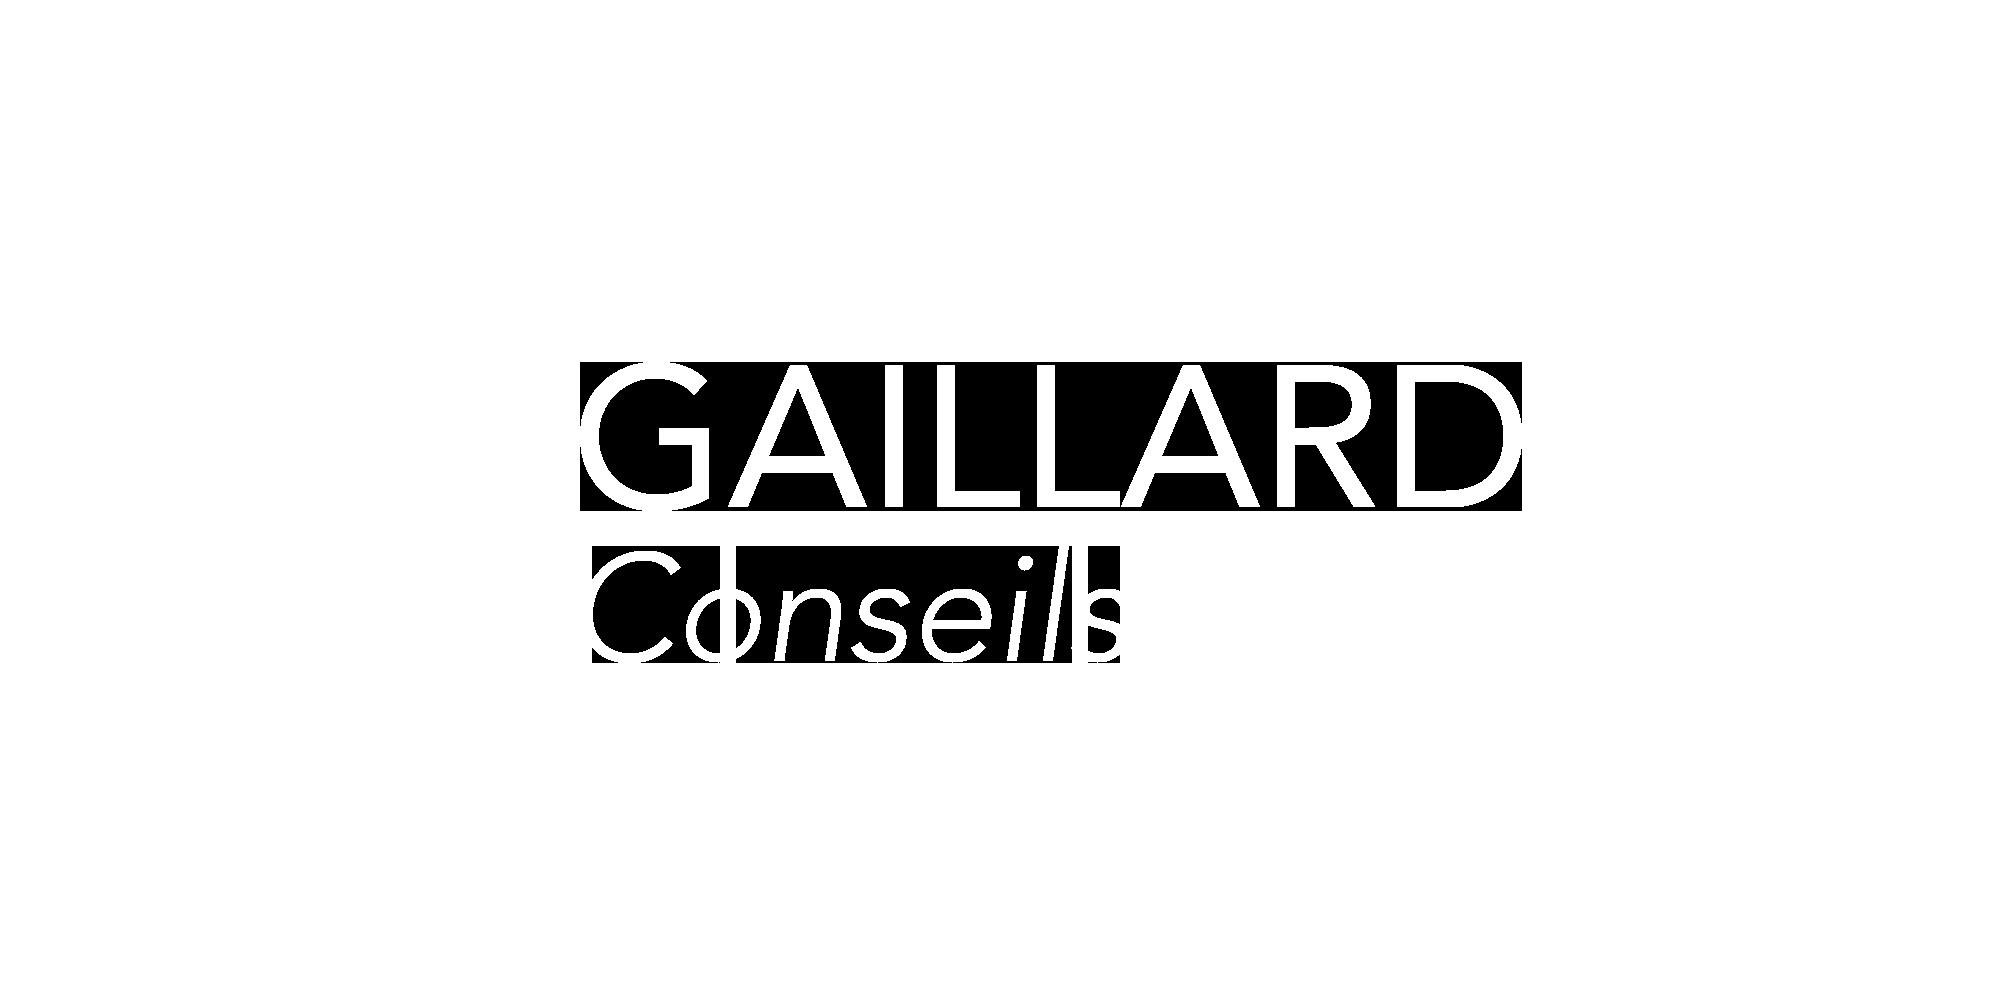 Gaillard Conseils | Cabinet d'Avocats à Brive-la-Gaillarde